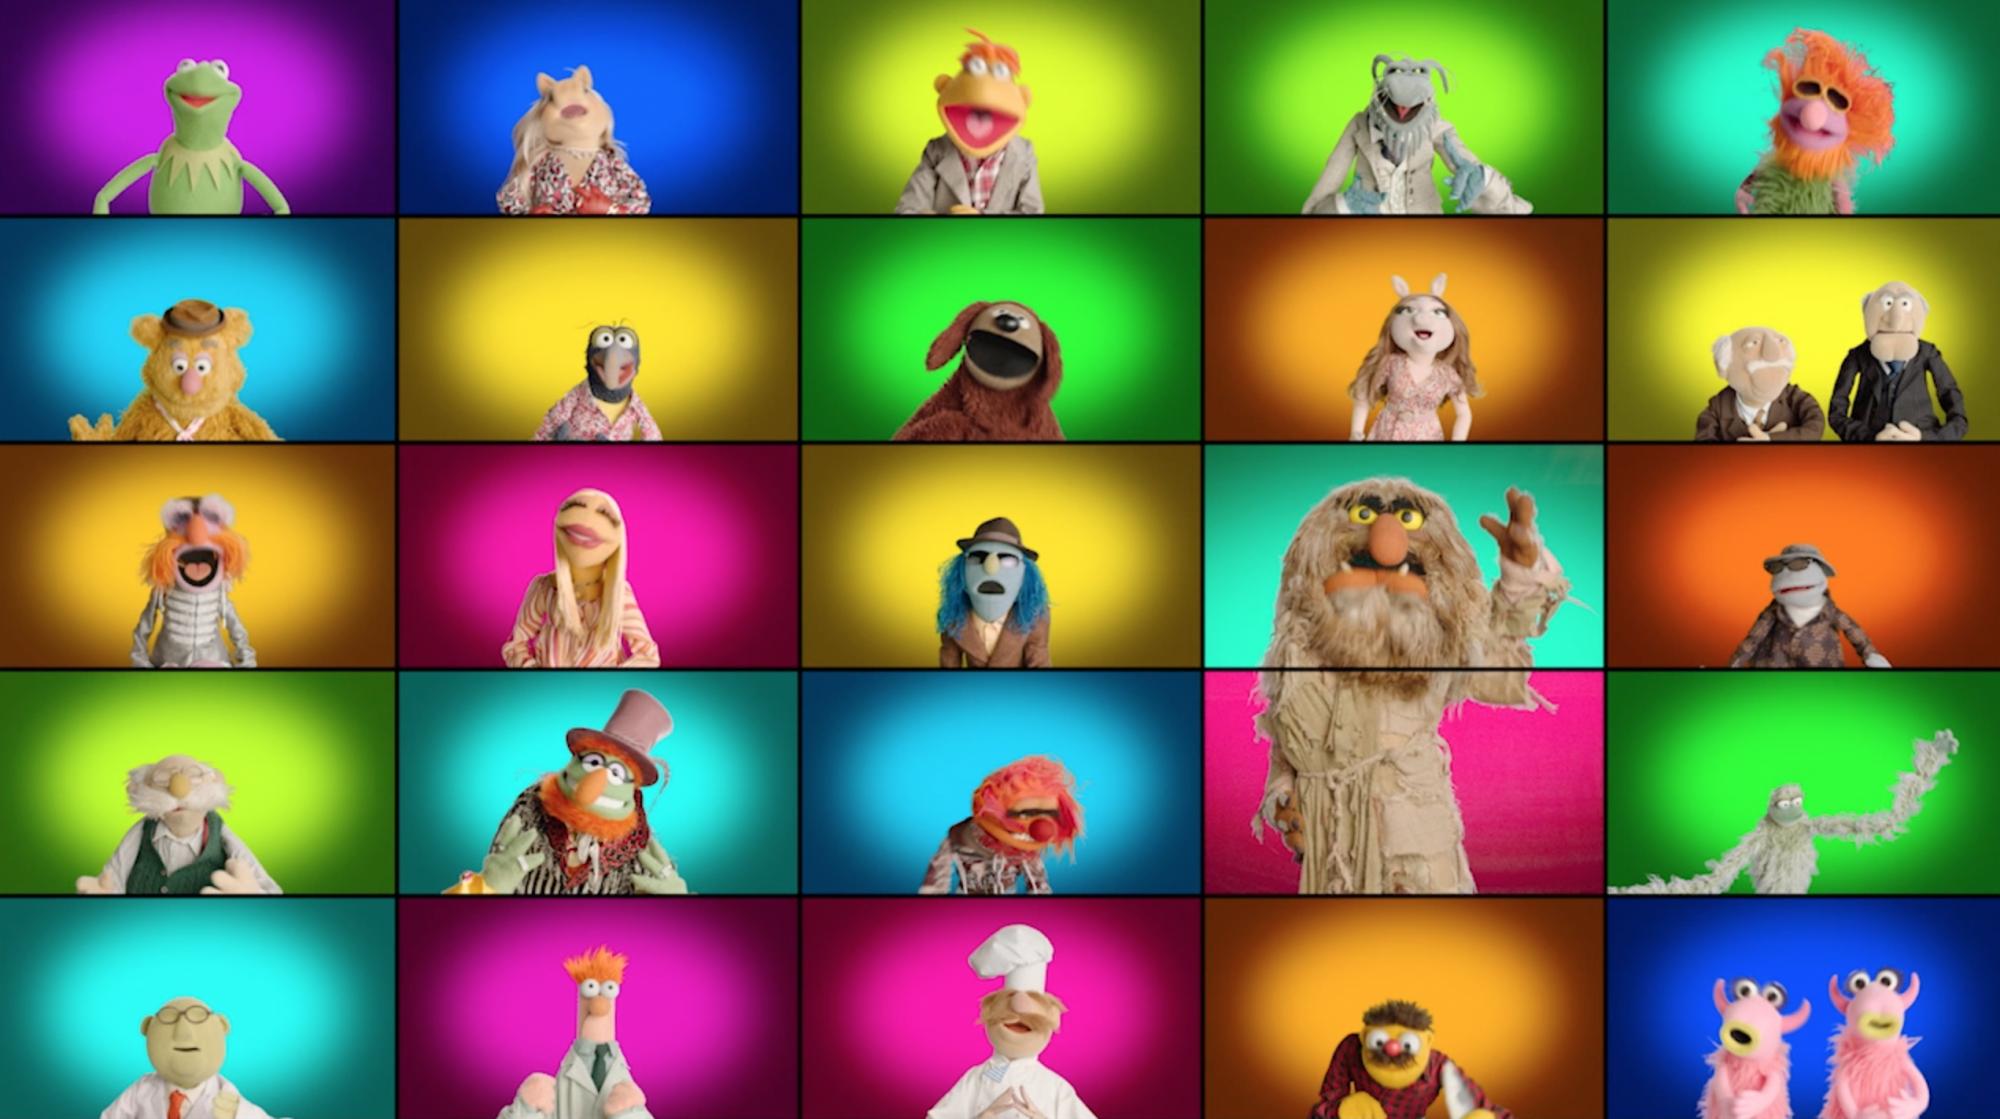 Muppets singing